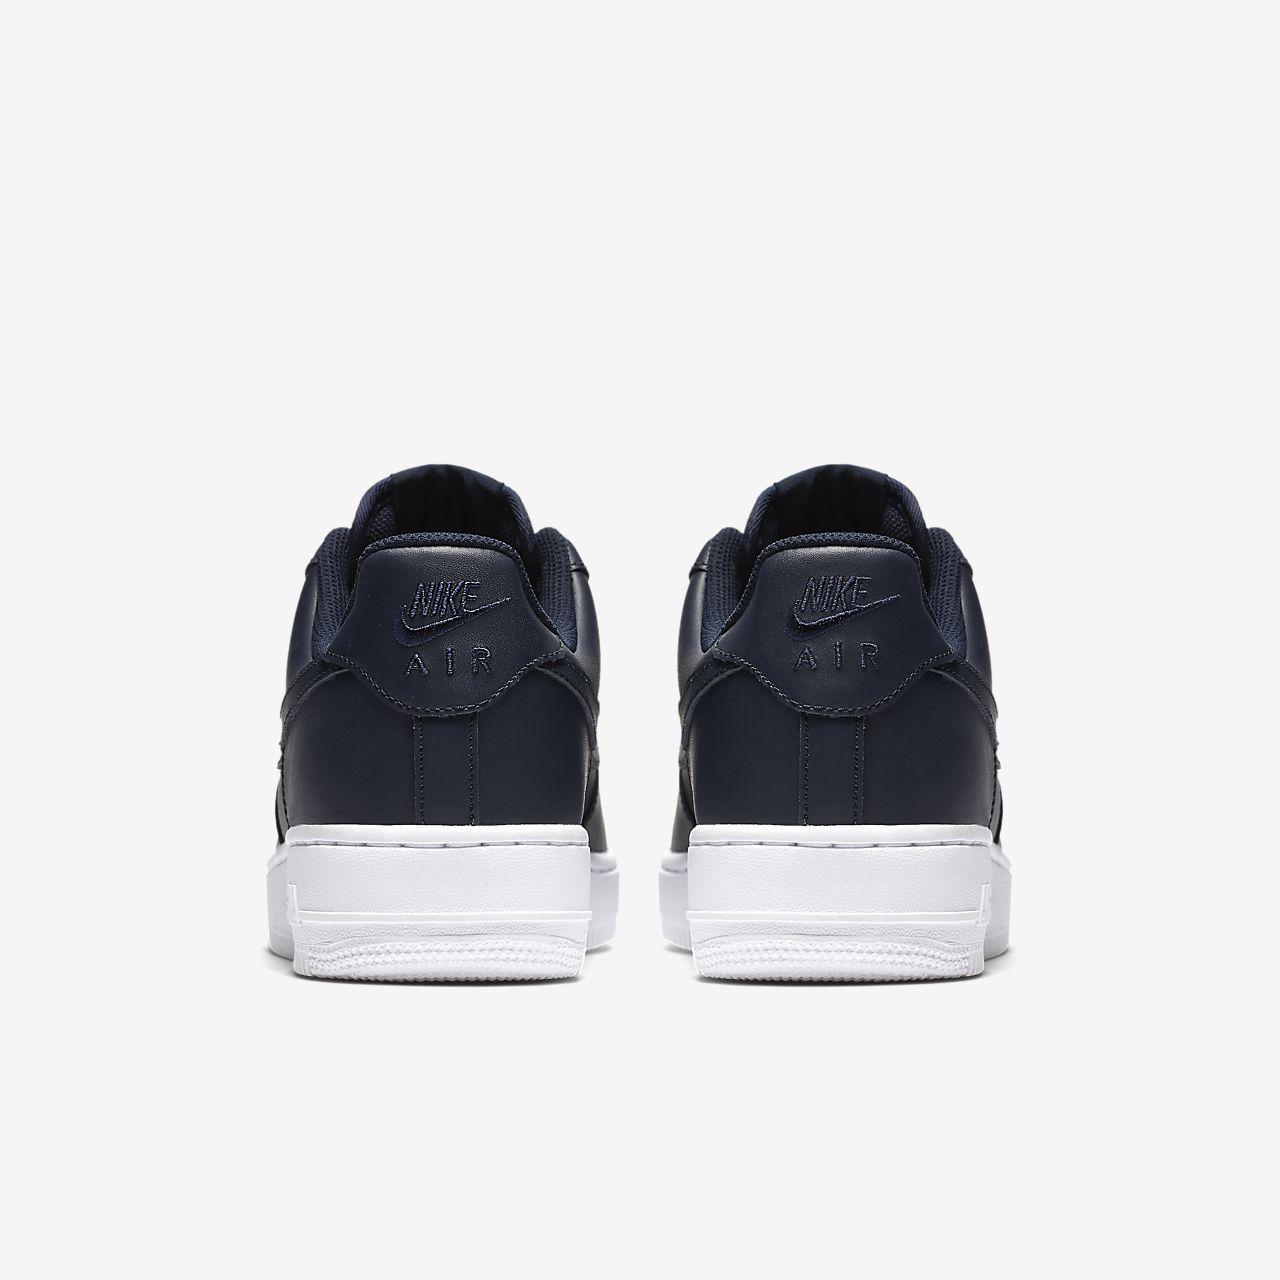 Nike 07 1 Pour Force Air Homme Chaussure PZuTXiOk